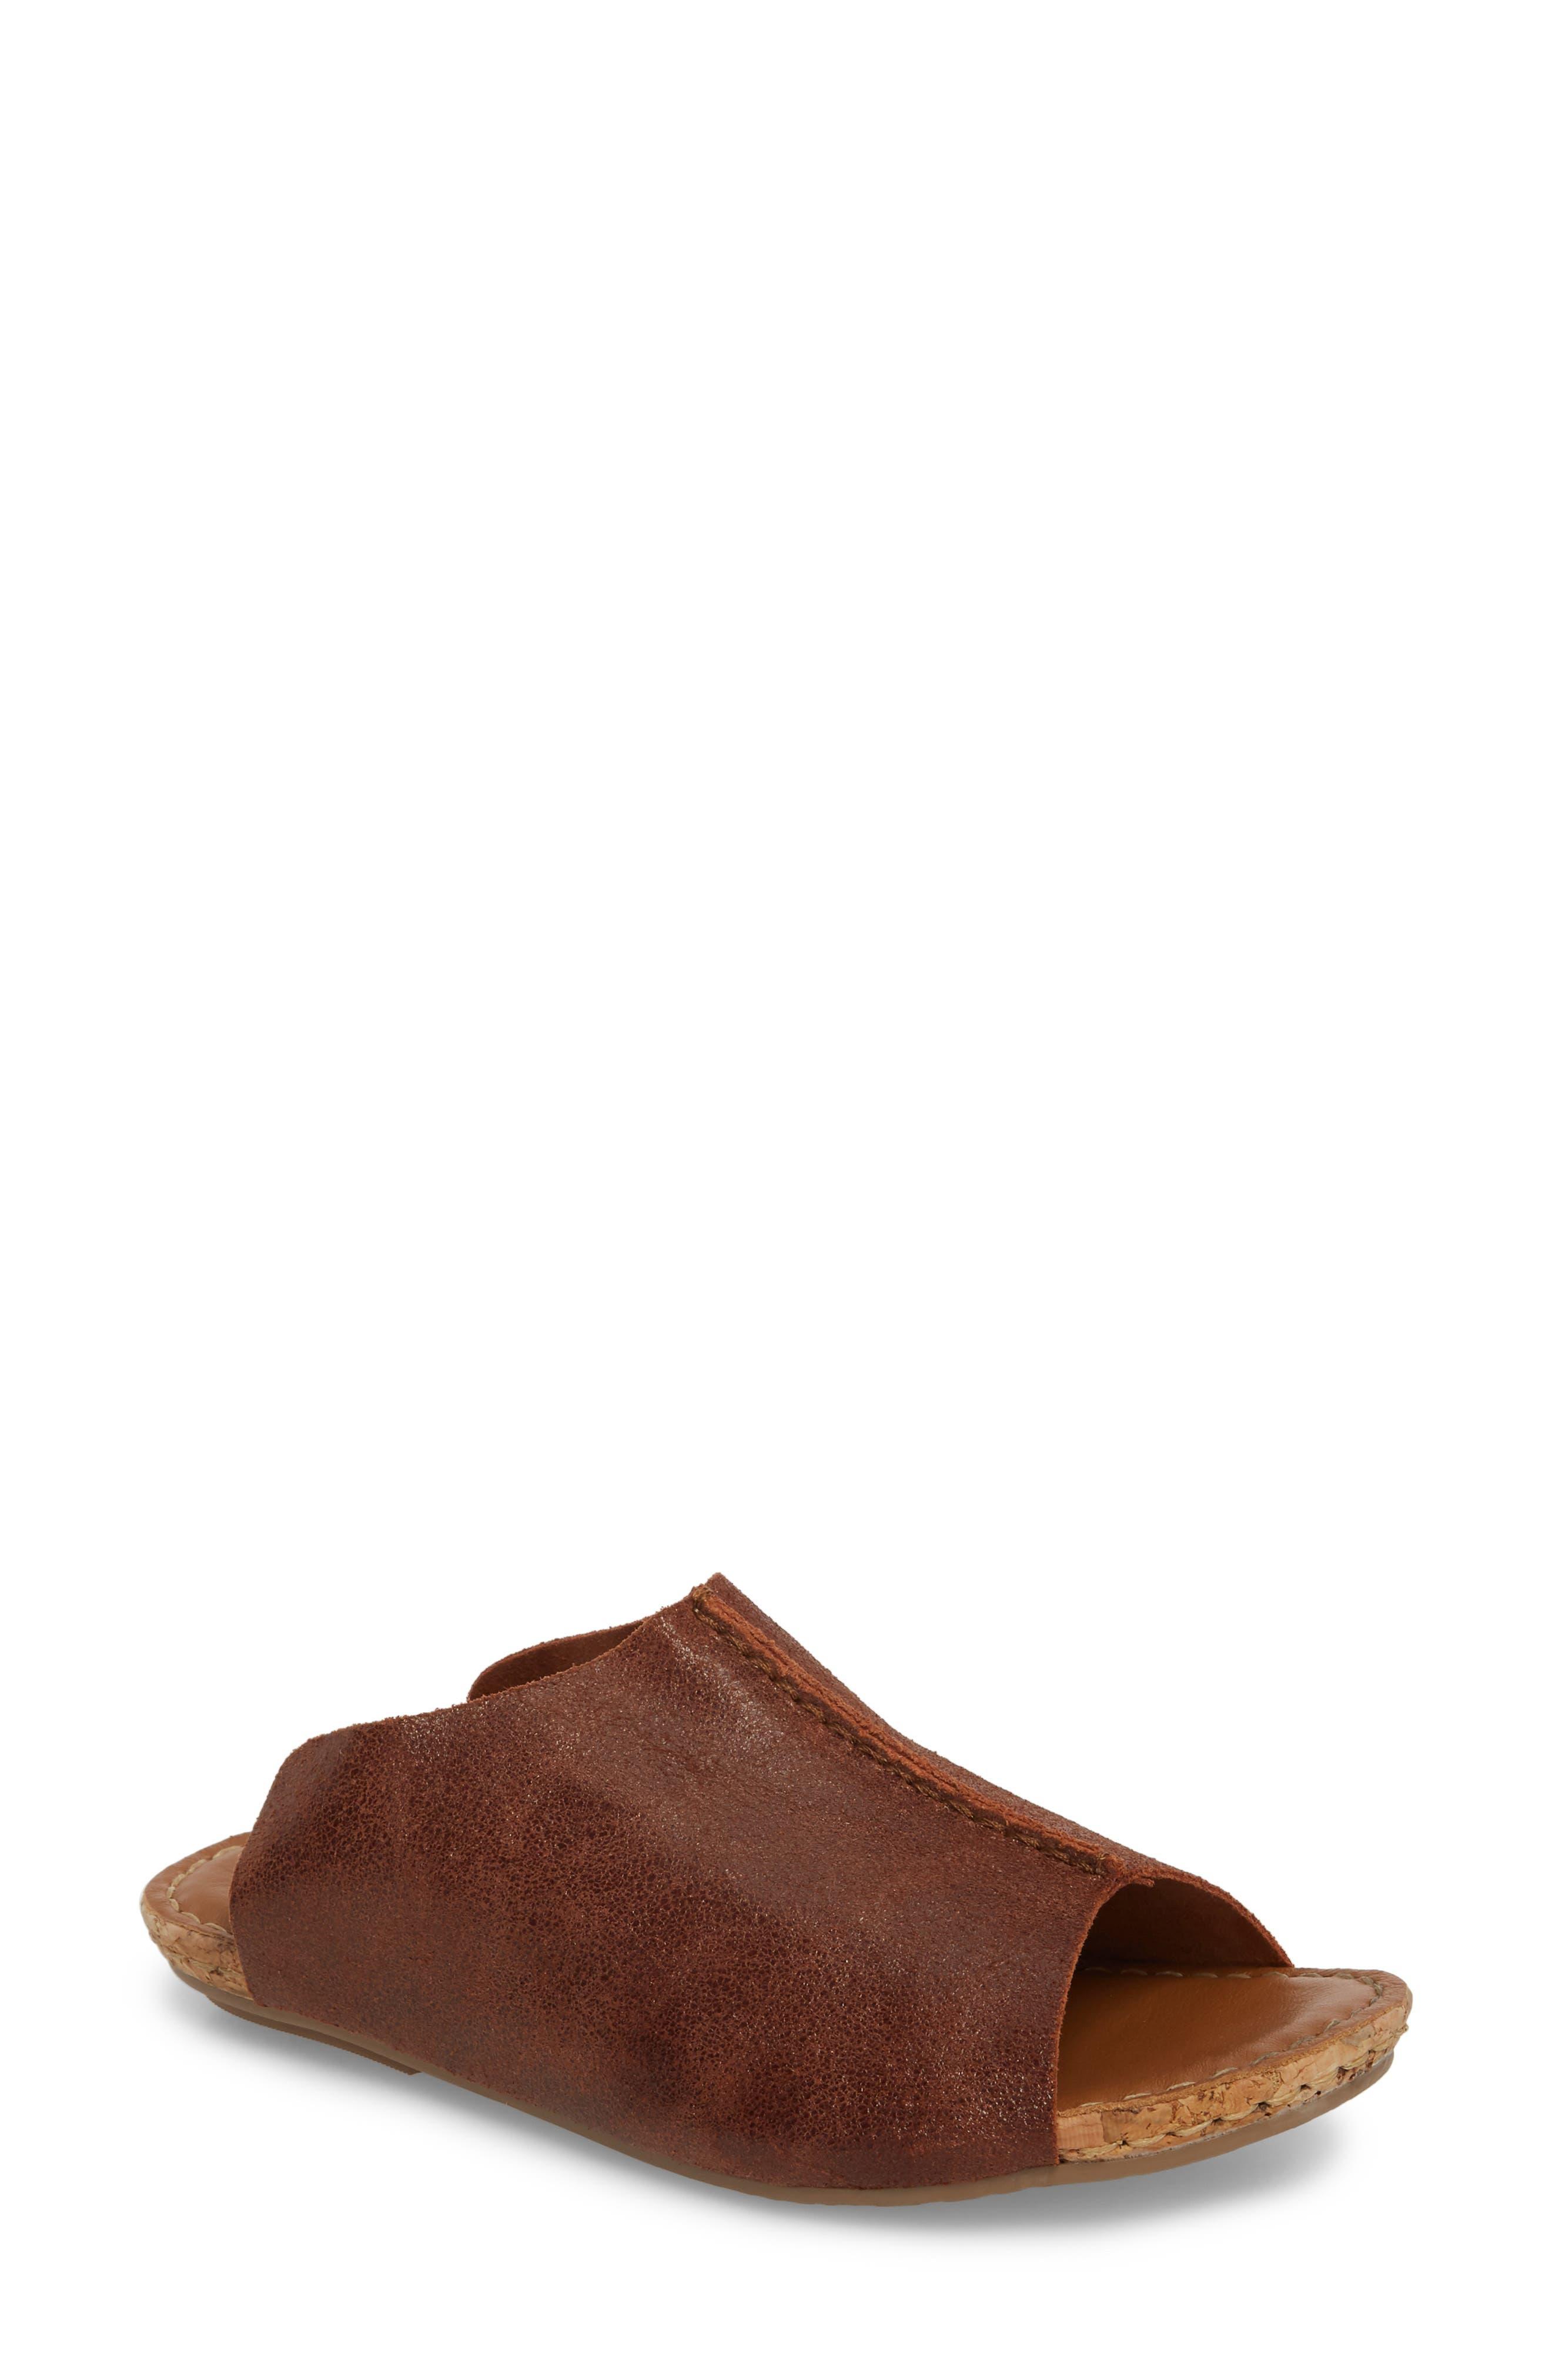 KLUB NICO Gracey Slide Sandal, Main, color, RUM LEATHER